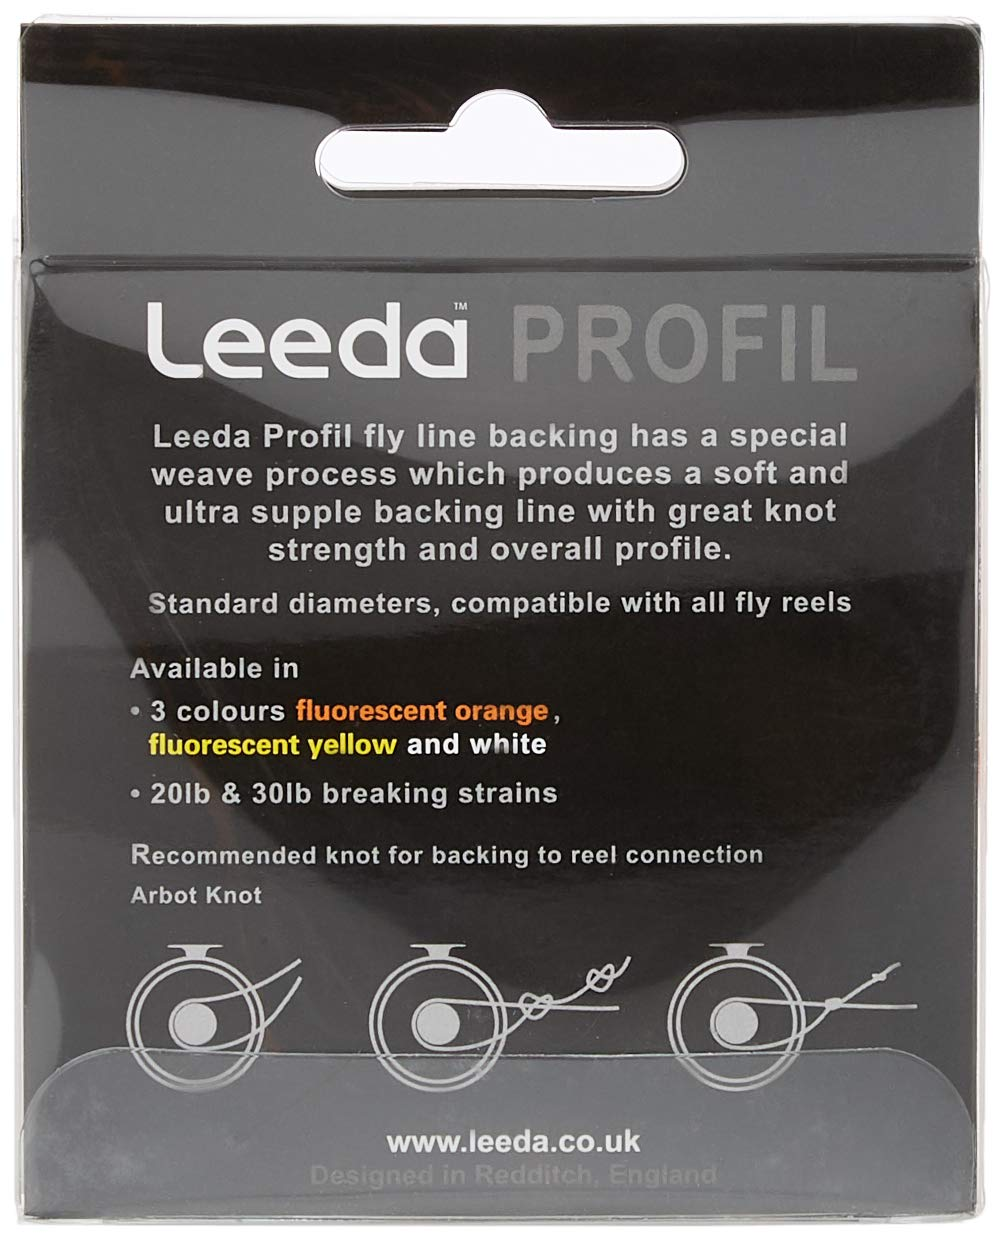 Leeda NEW Profil Soft /& Ultra Supple High Knot Strength Fly Fishing Backing Line